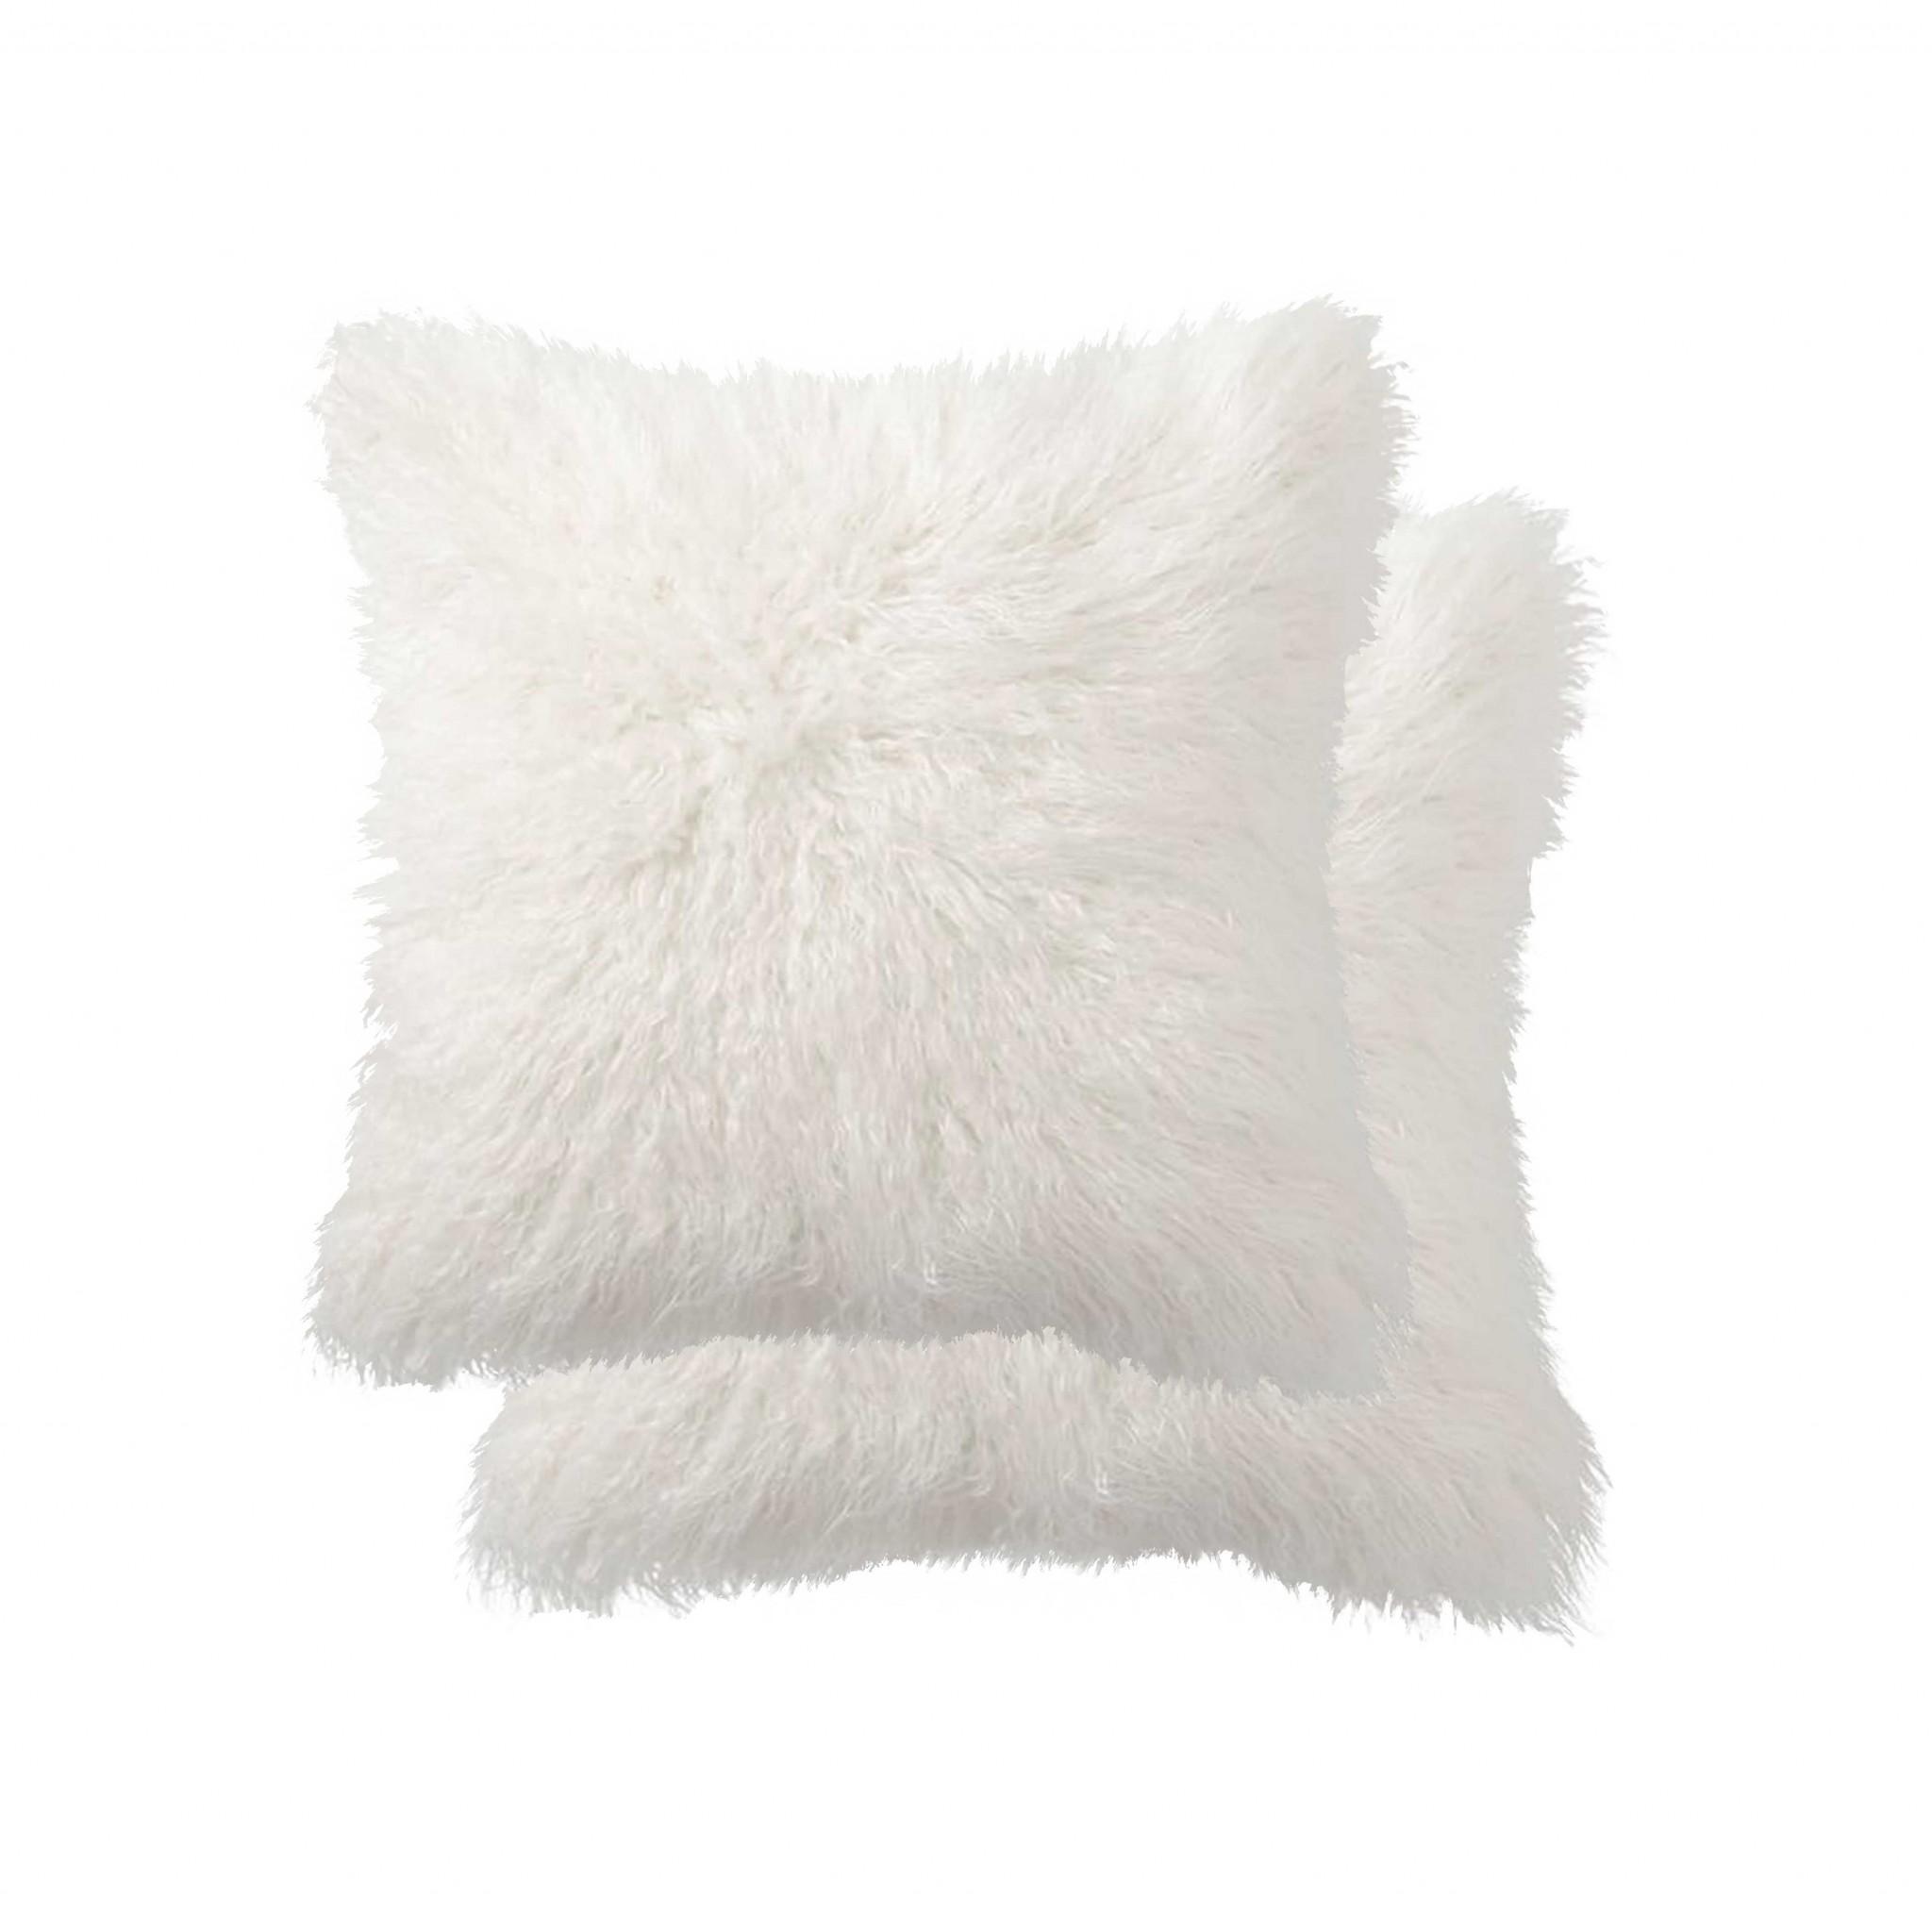 "18"" x 18"" x 5"" Off White, Faux Fur - Pillow 2-Pack"